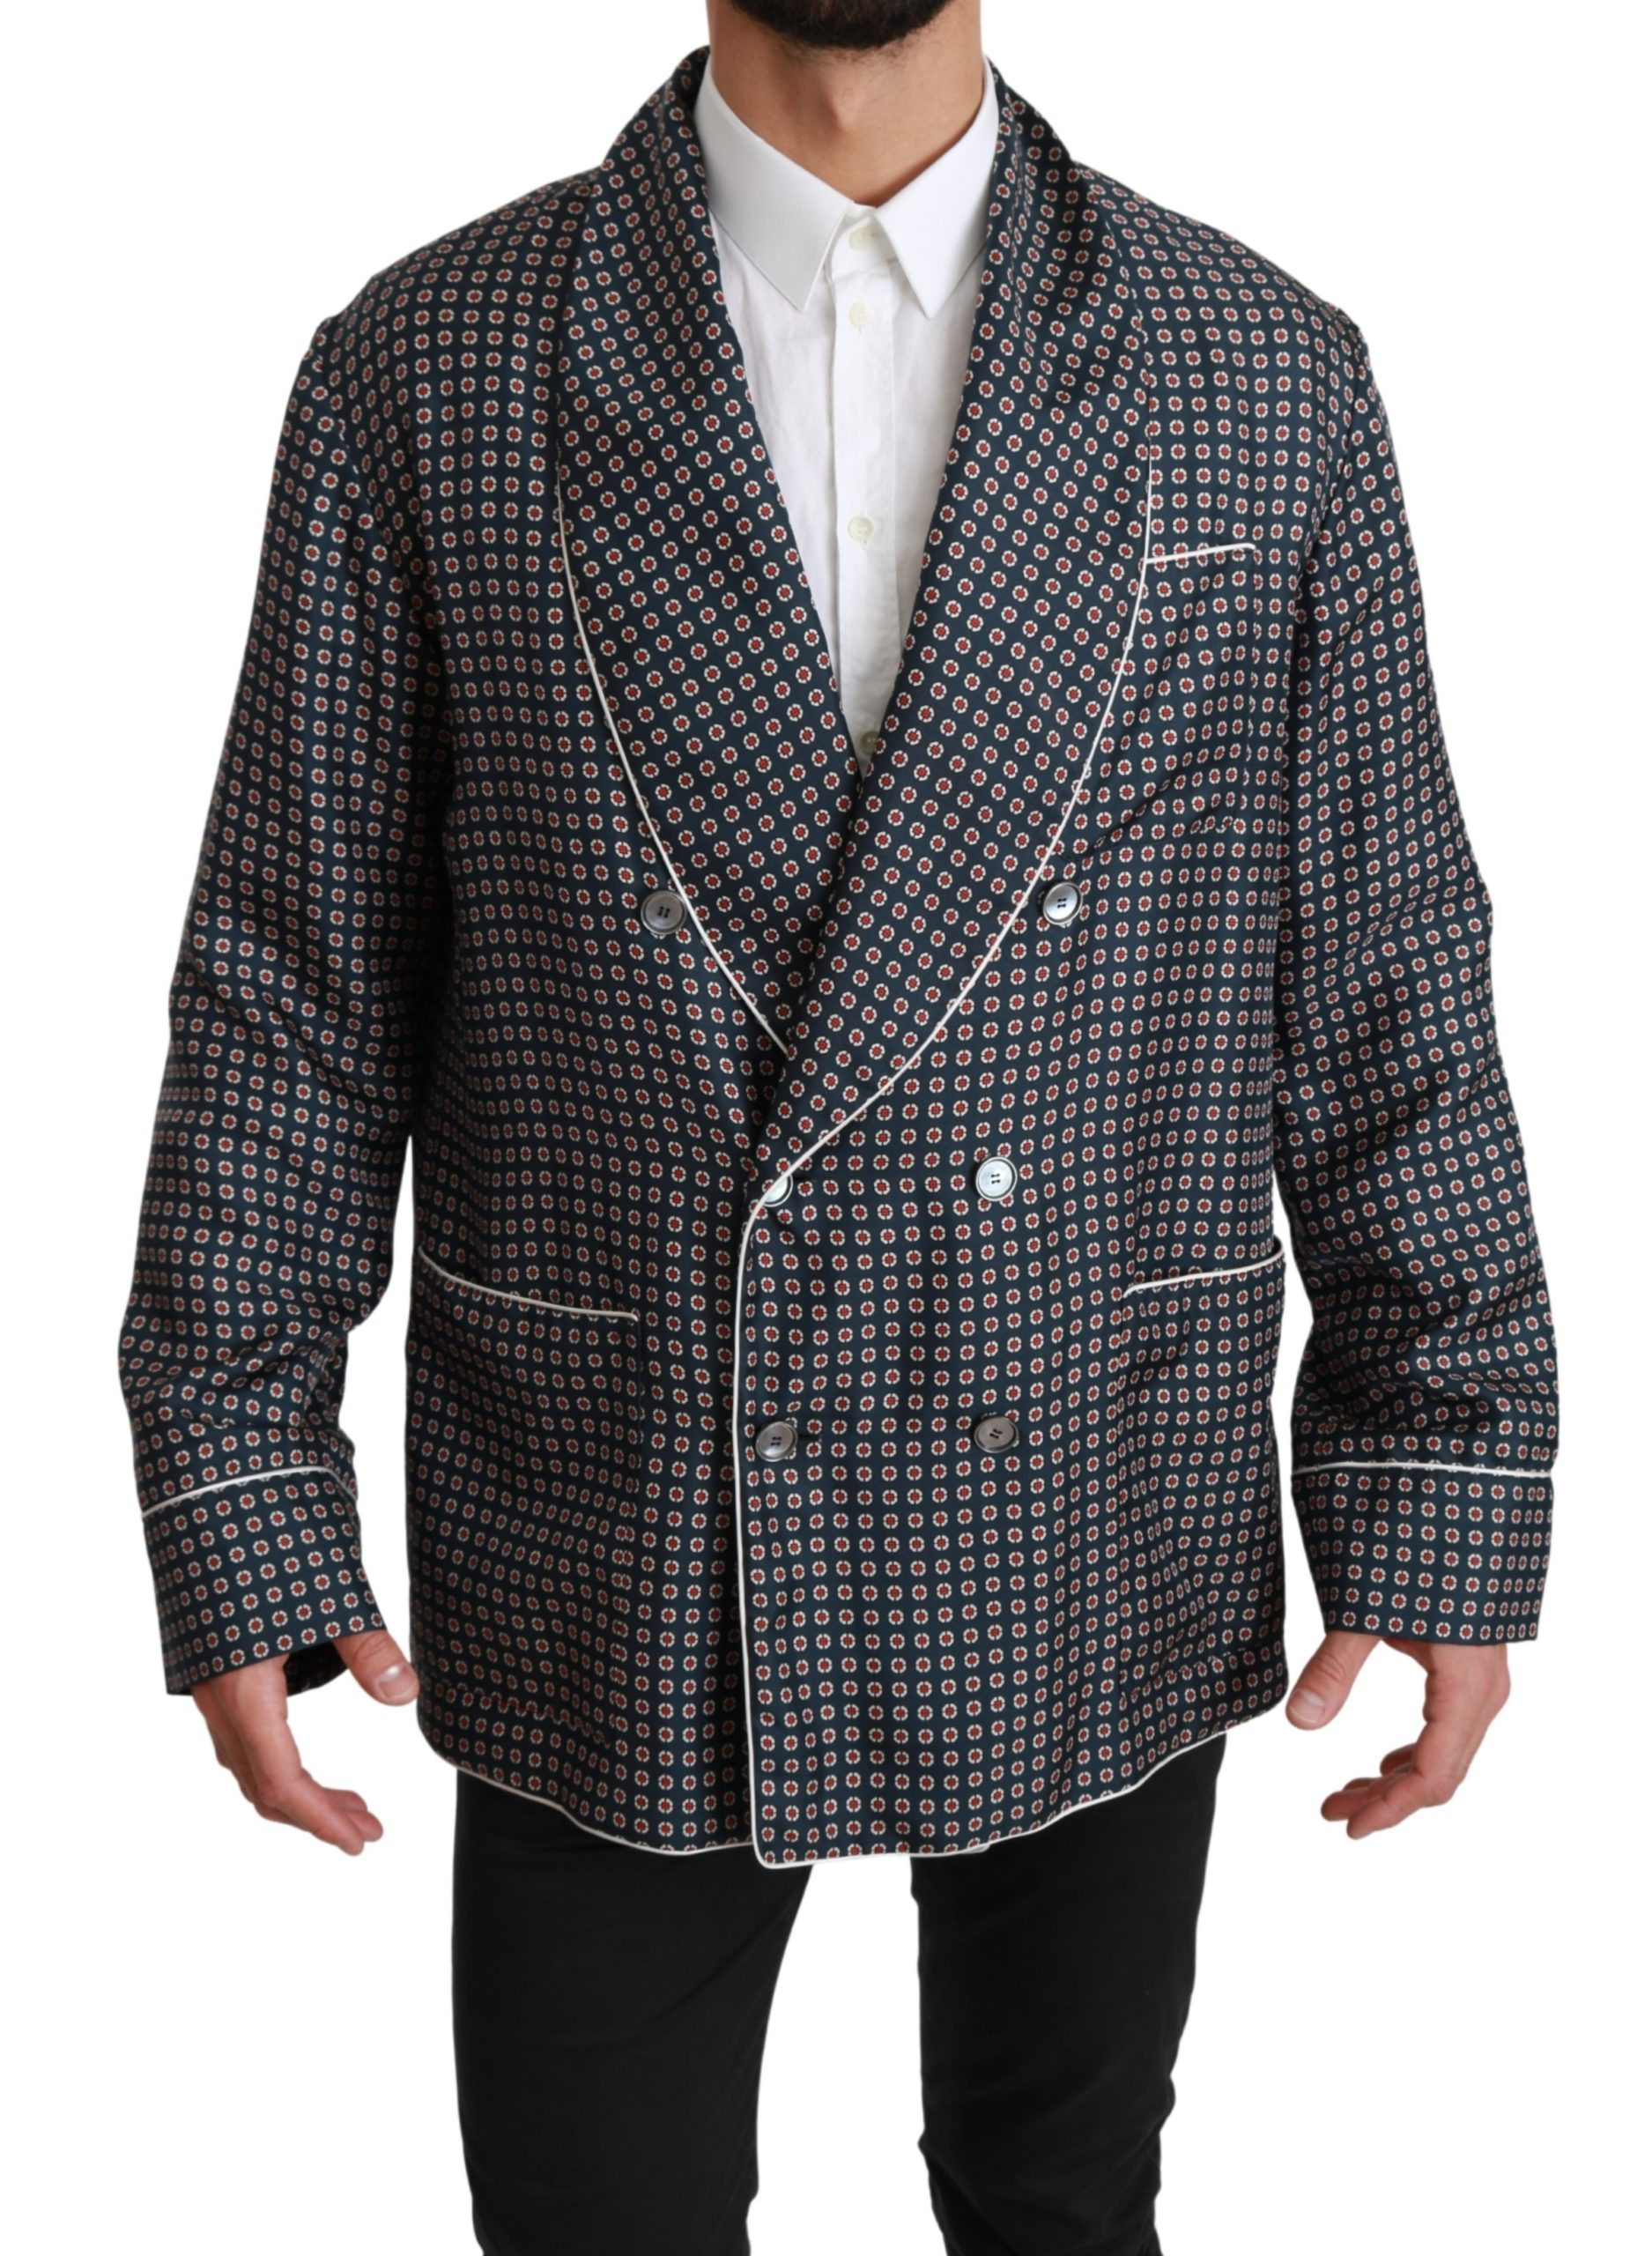 Dolce & Gabbana Men's Patterned Double Breasted Coat Blue JKT2589 - IT4 | L